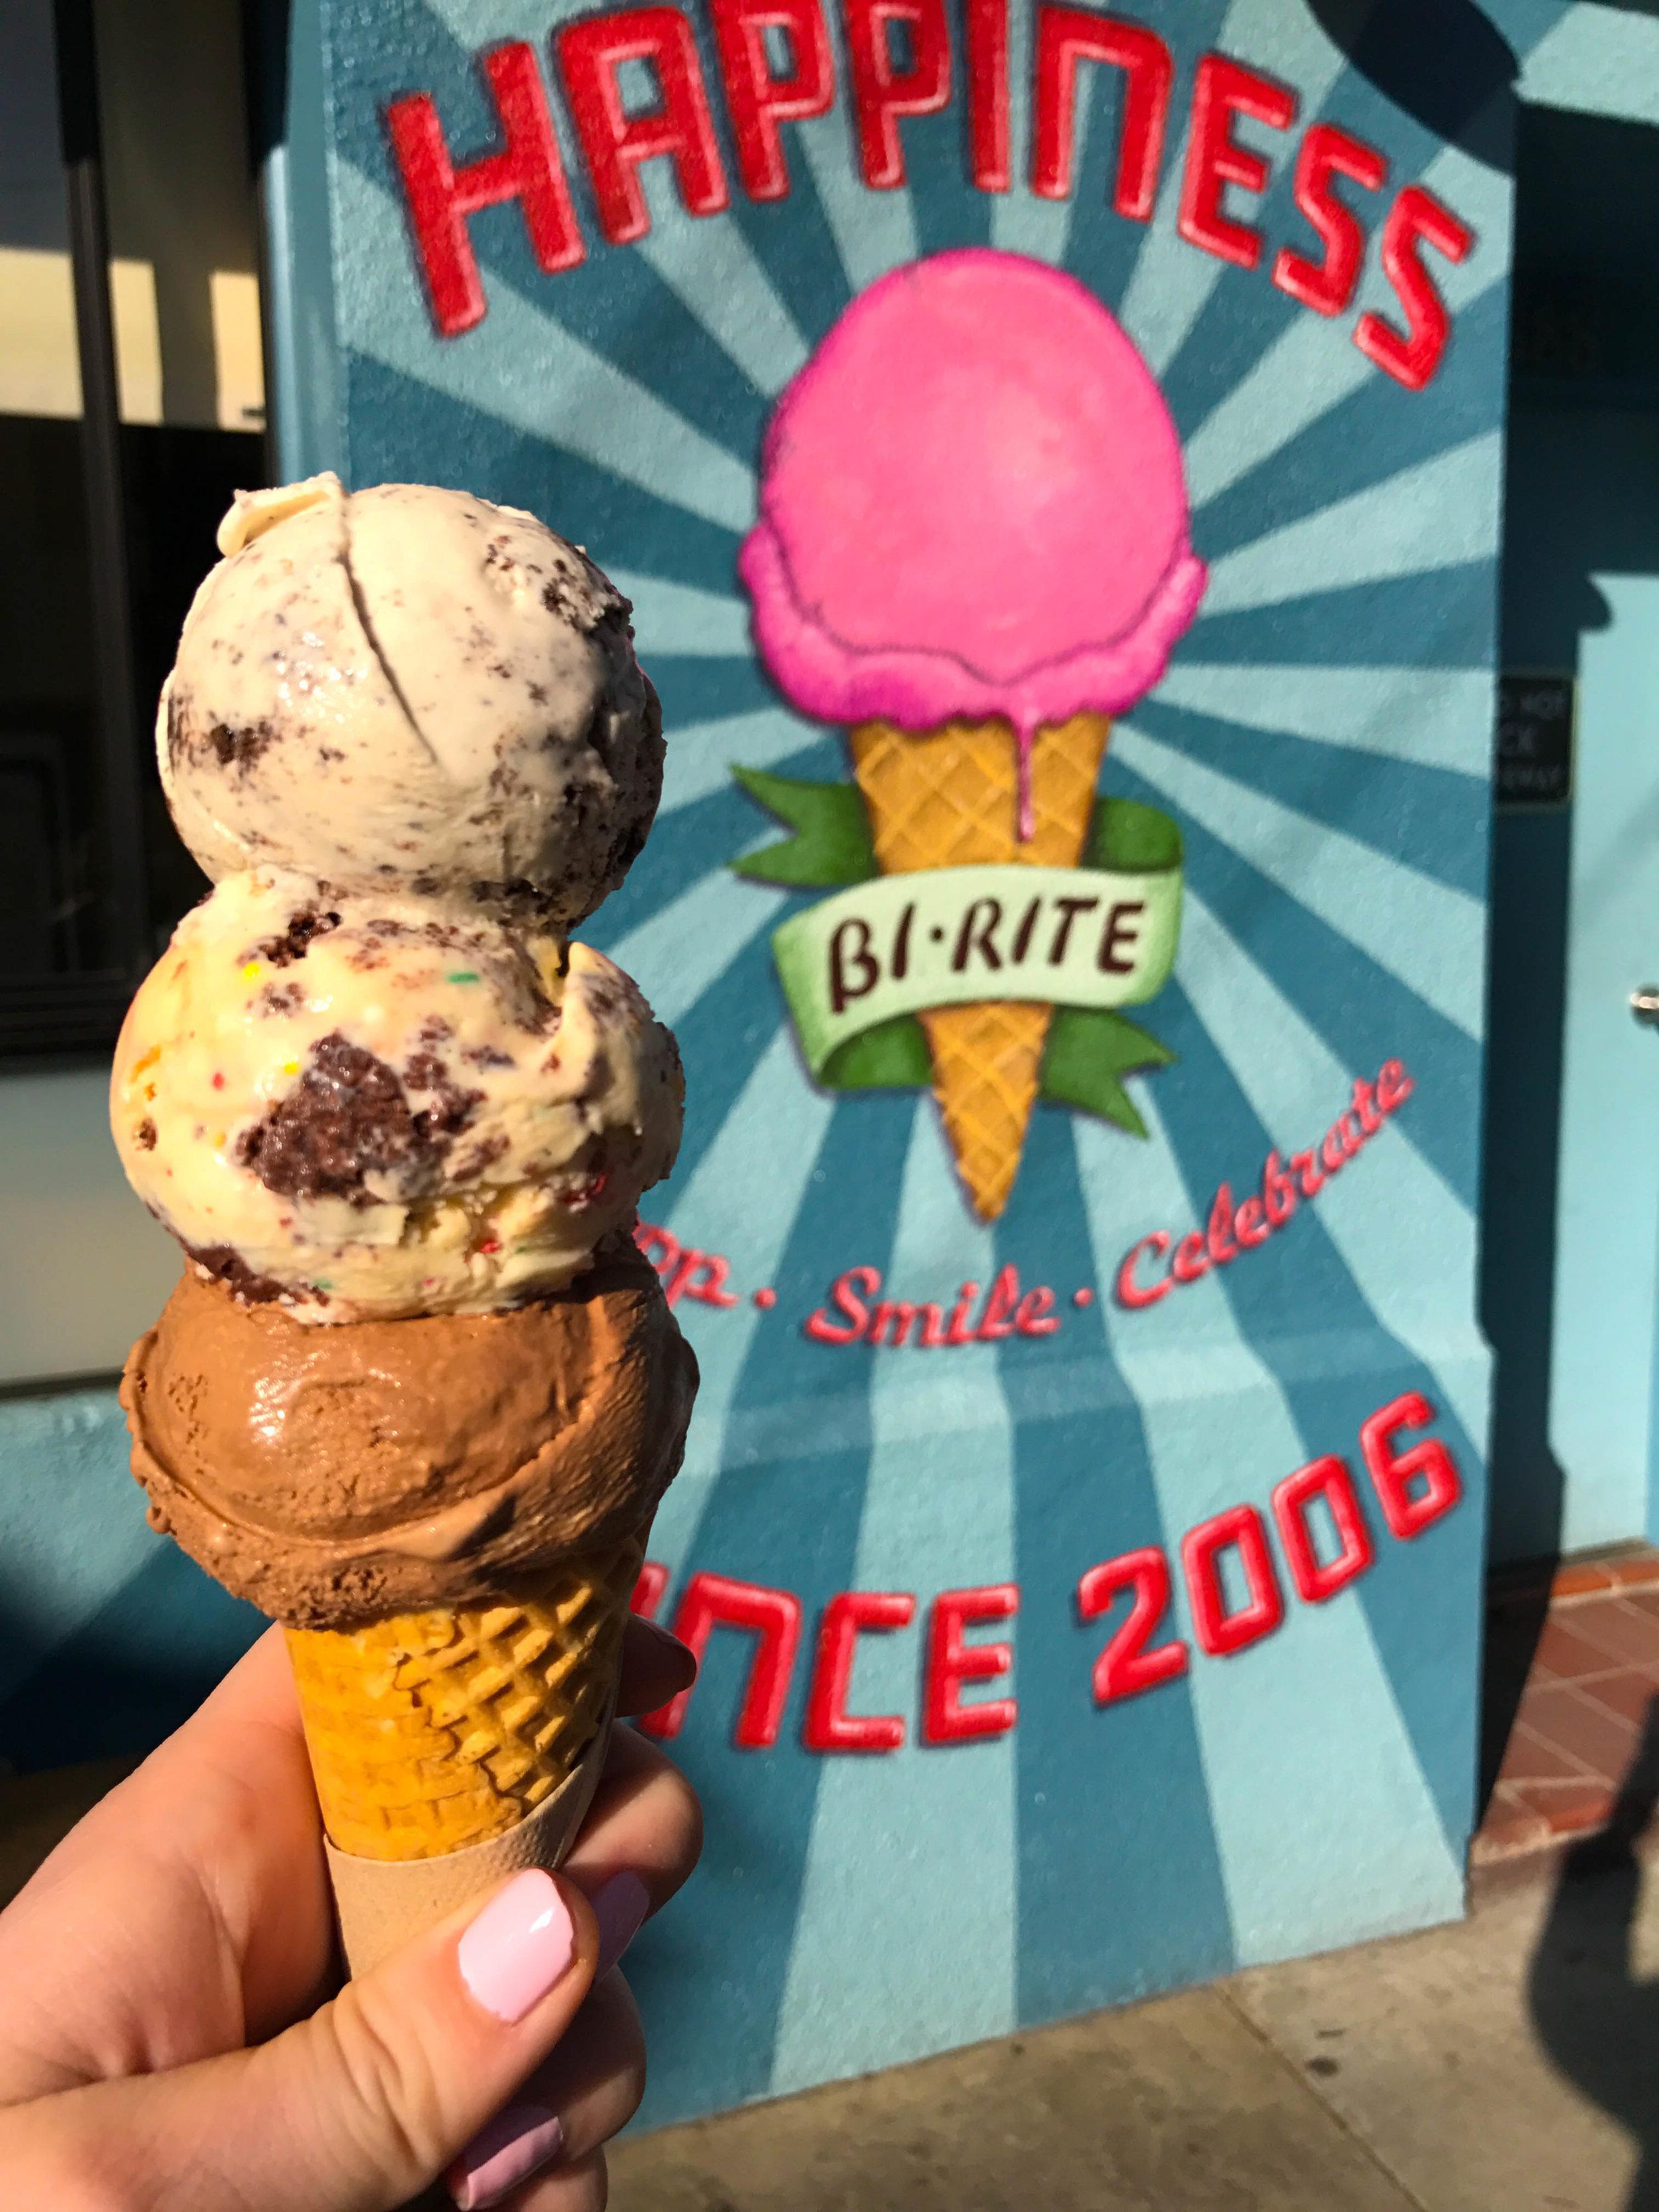 San Francisco Best Ice Cream - Bi-rite Creamery